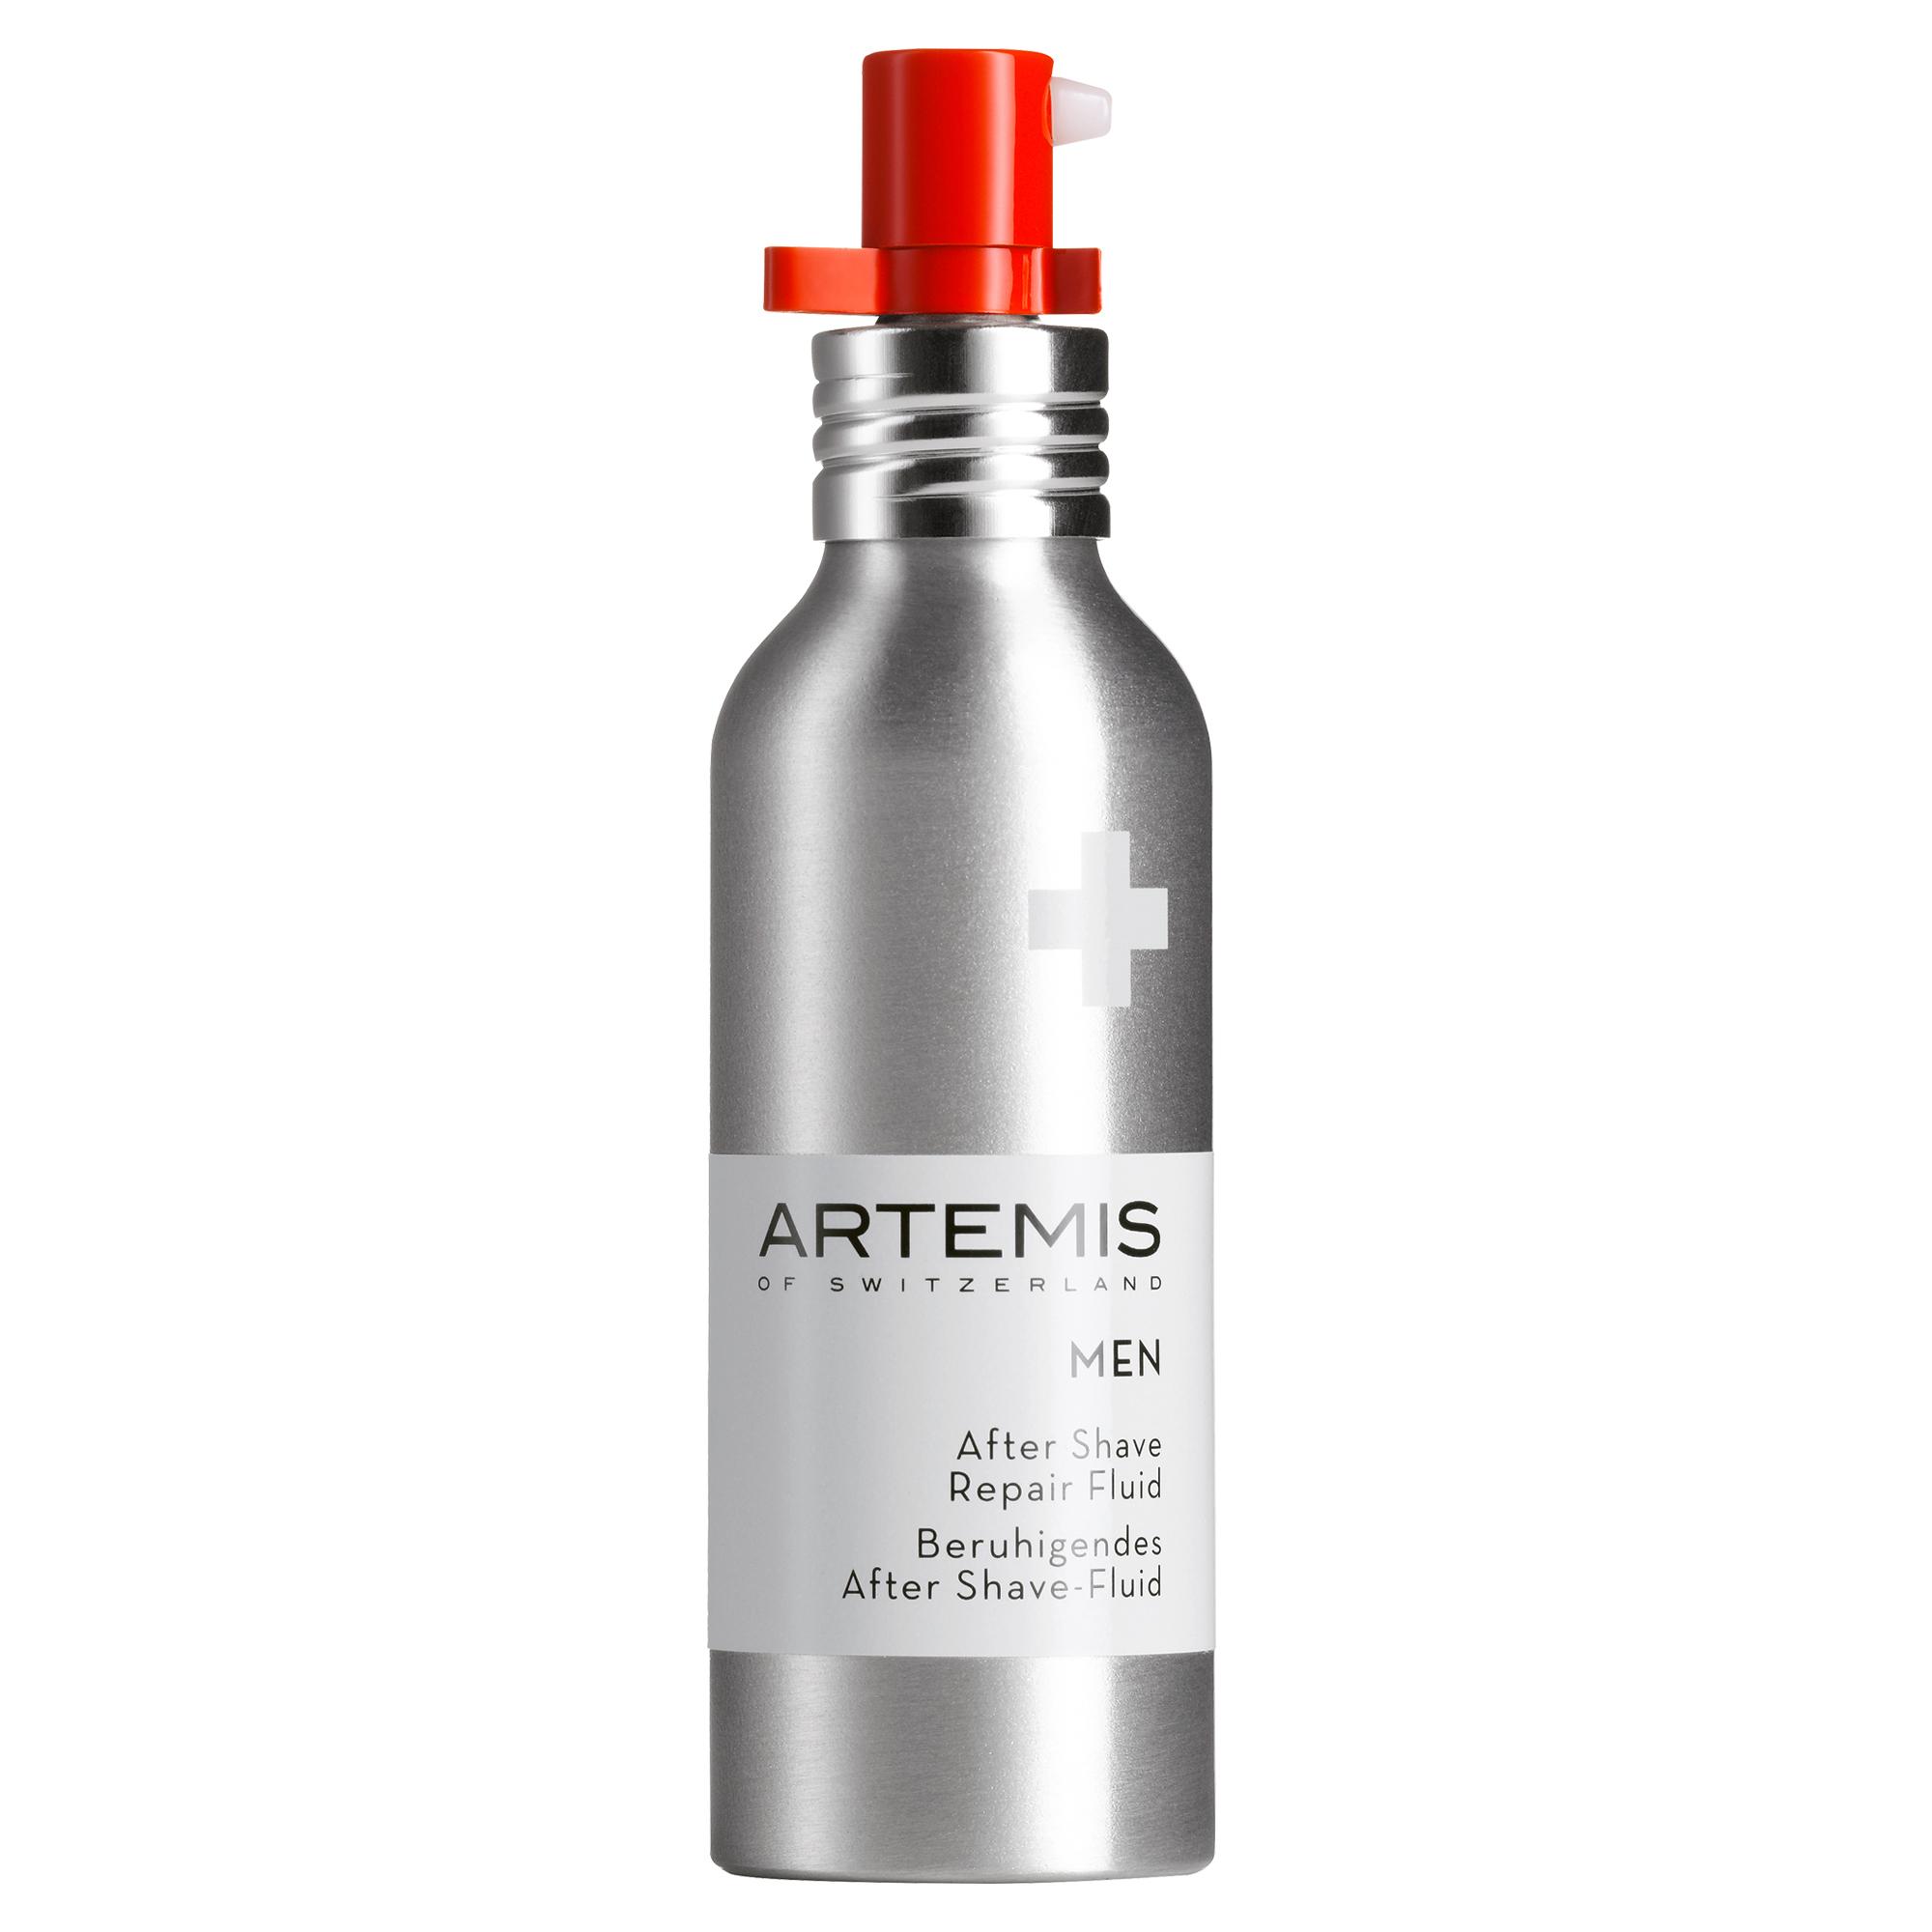 Artemis Men After Shave Repair Fluid 75ml